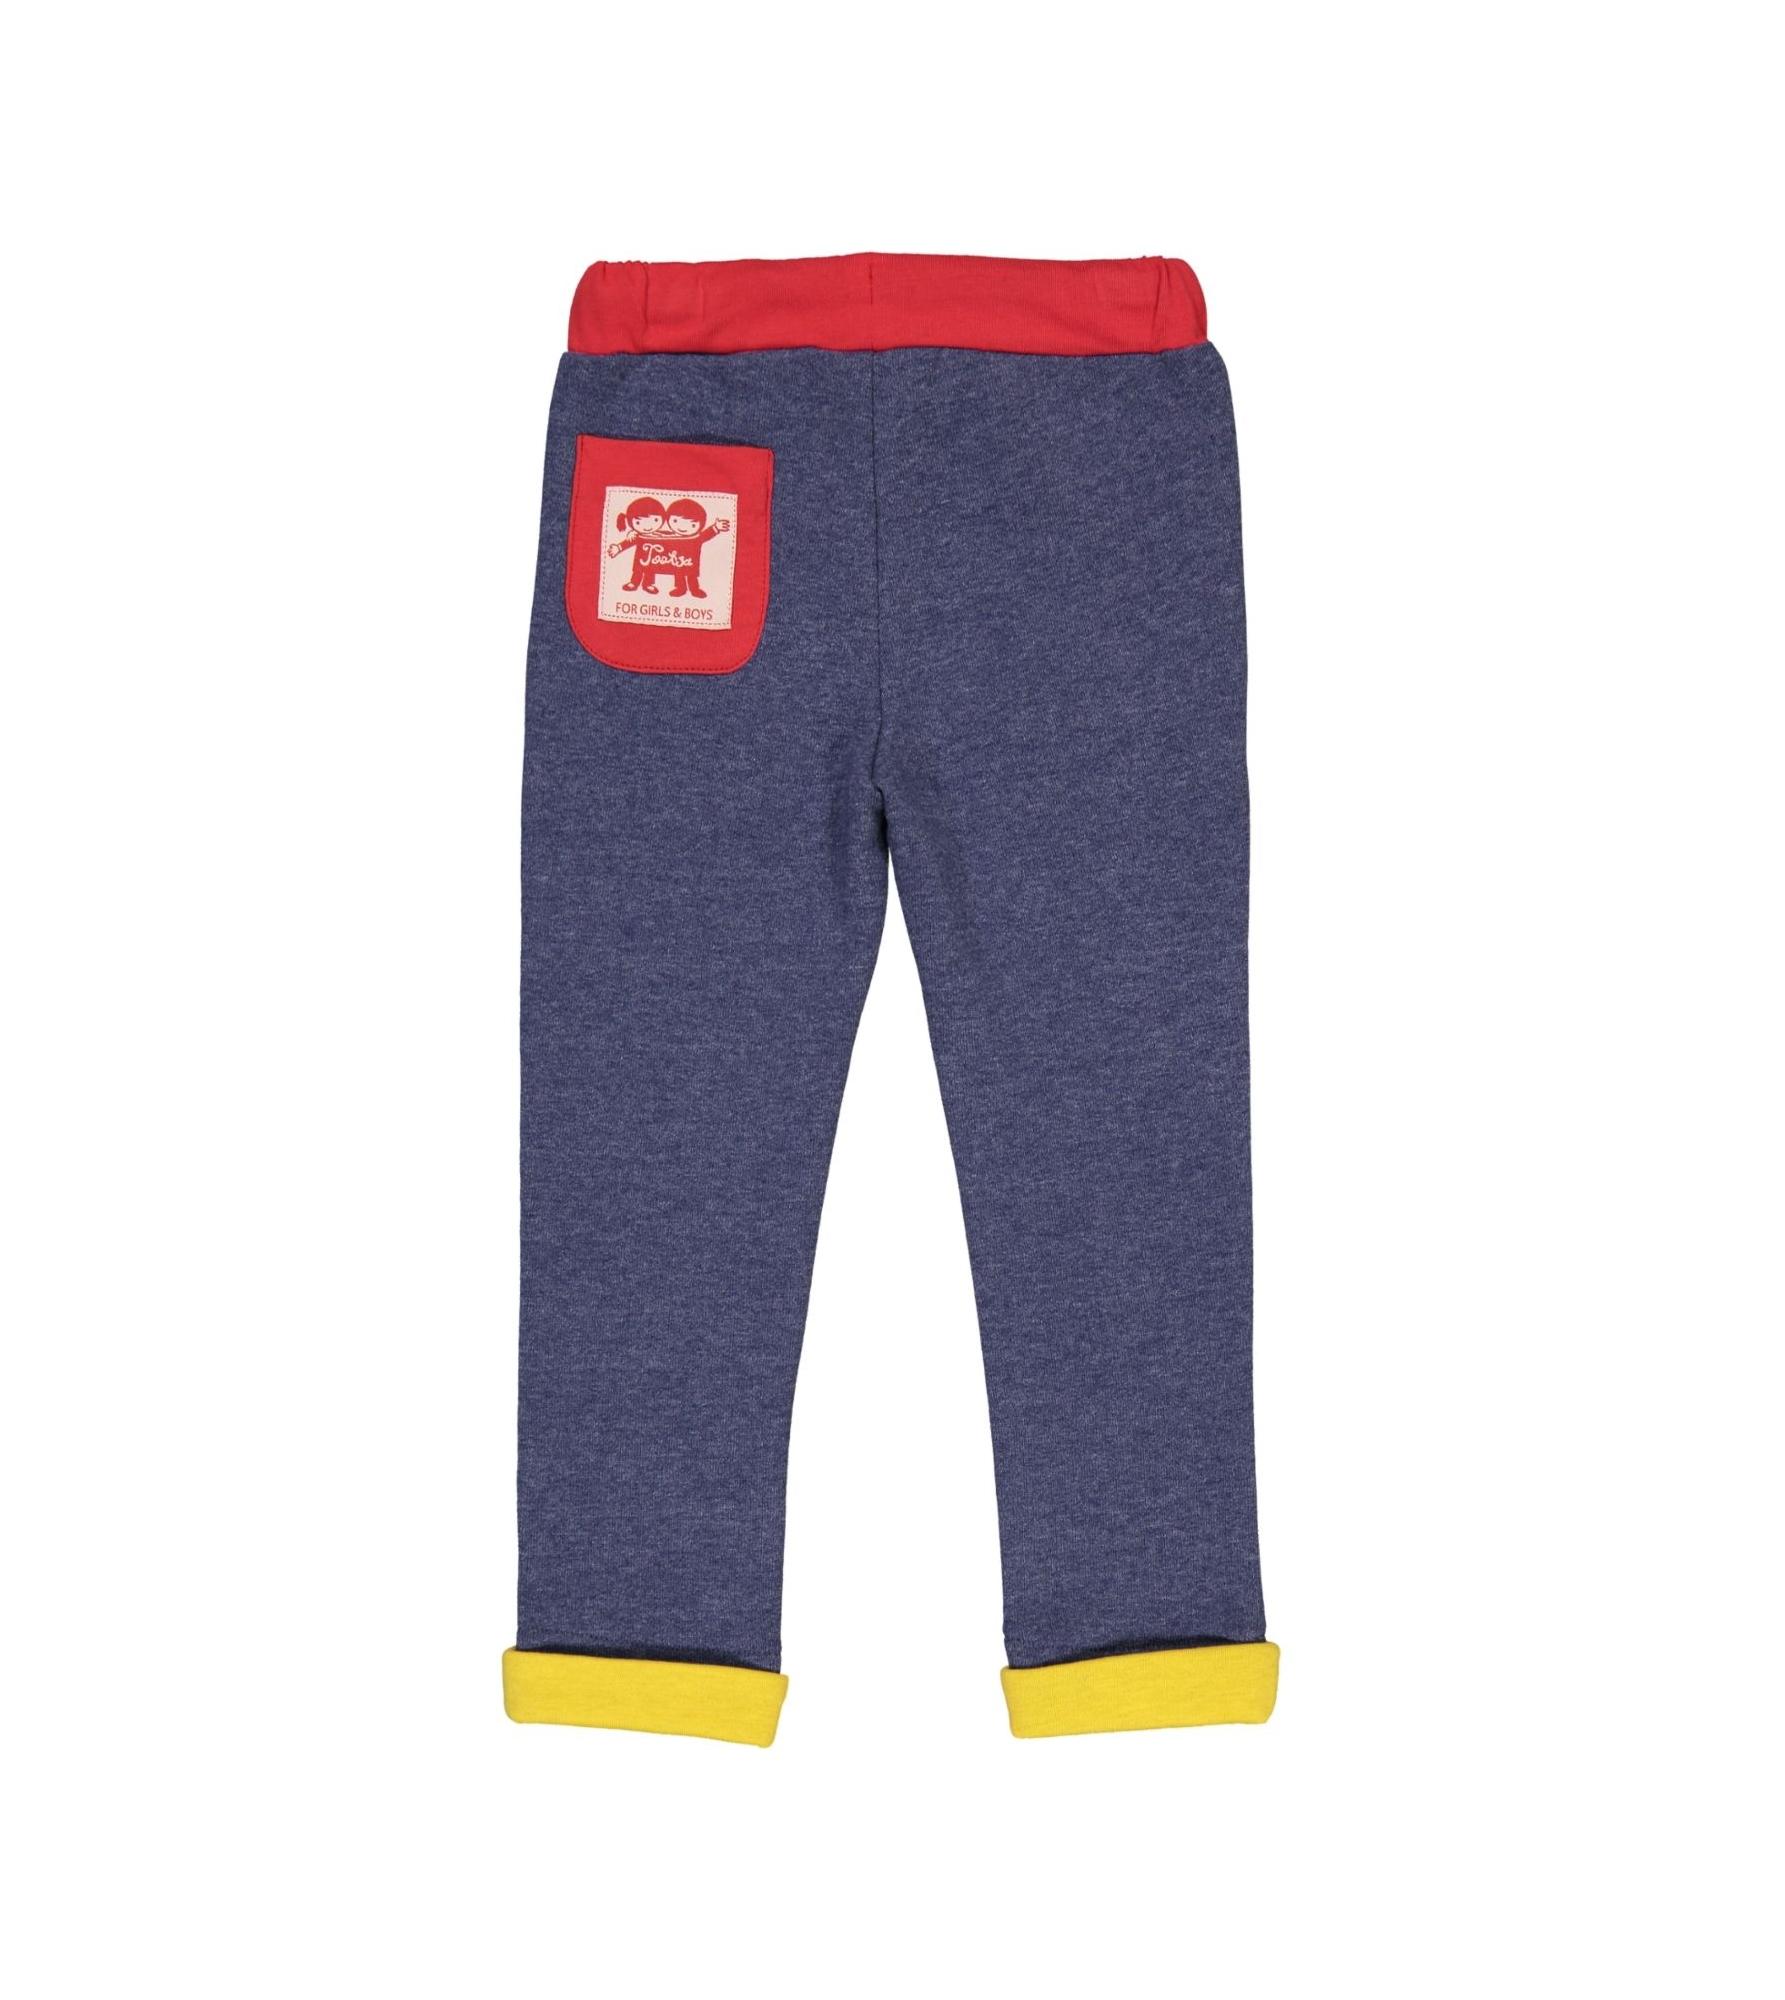 Malmo Slim Fit Sweatpants Heather Blue Back_downsized.jpg